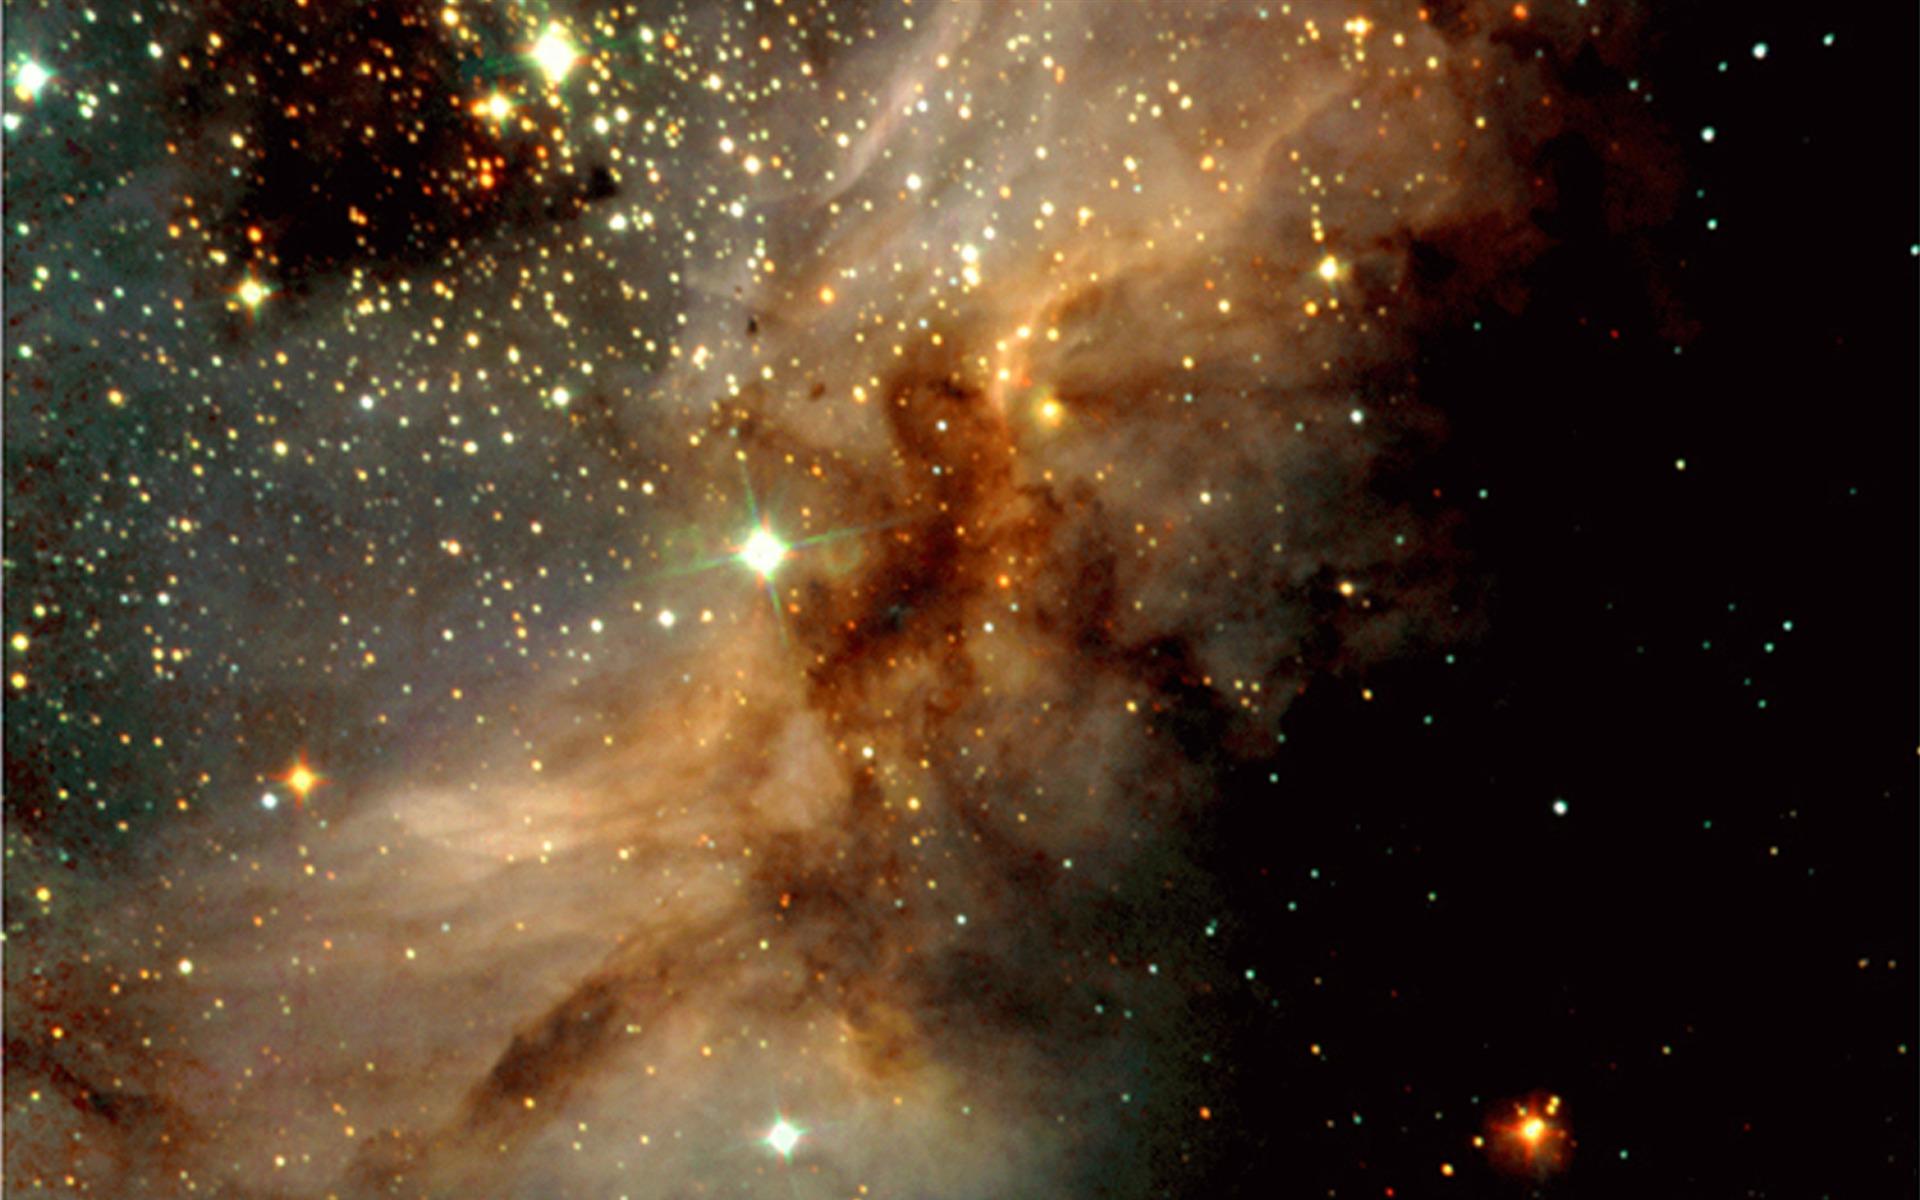 Nebula in the universe-Explore the secrets of the universe ...